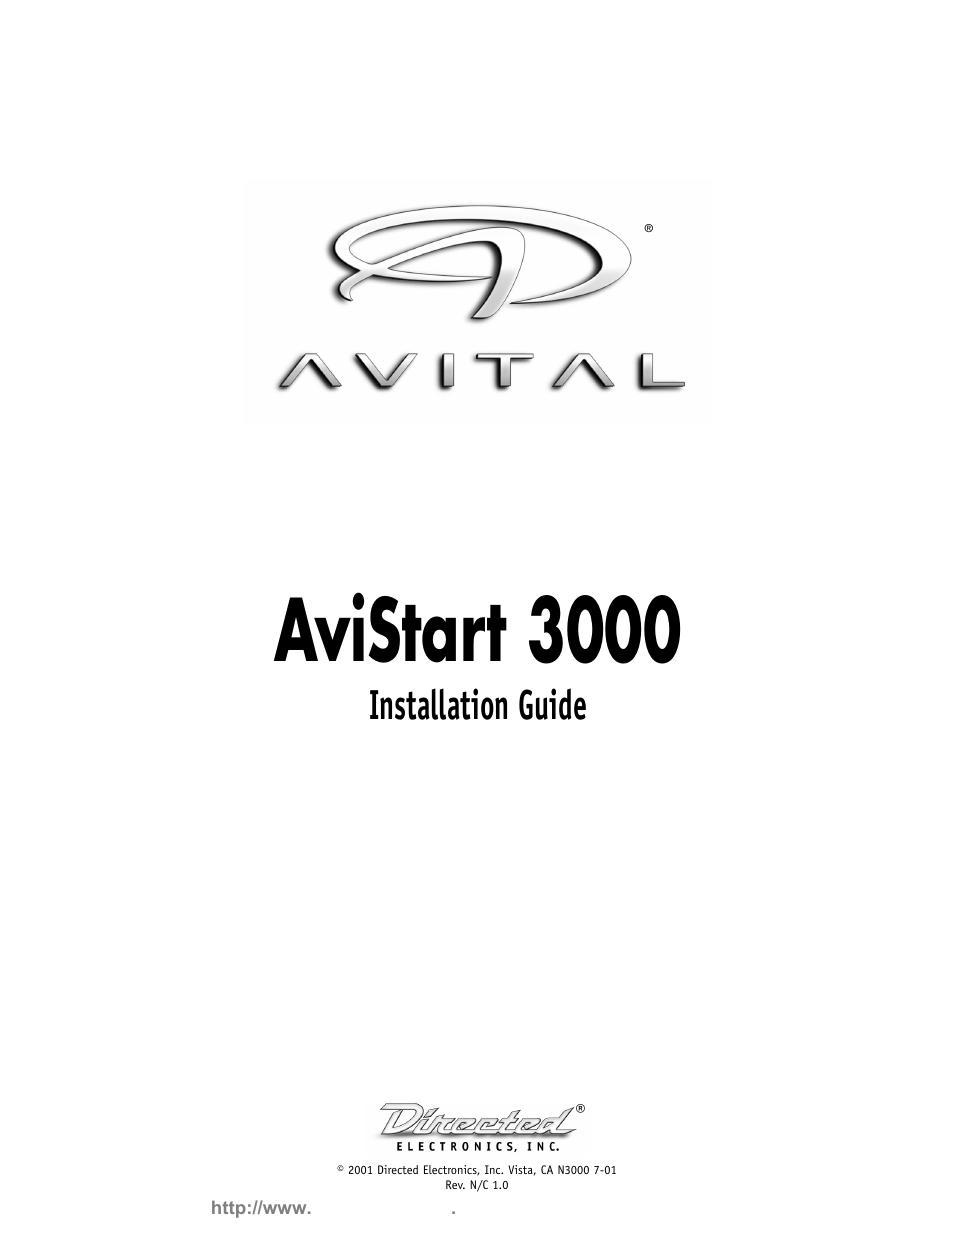 avital avistart 3000 user manual